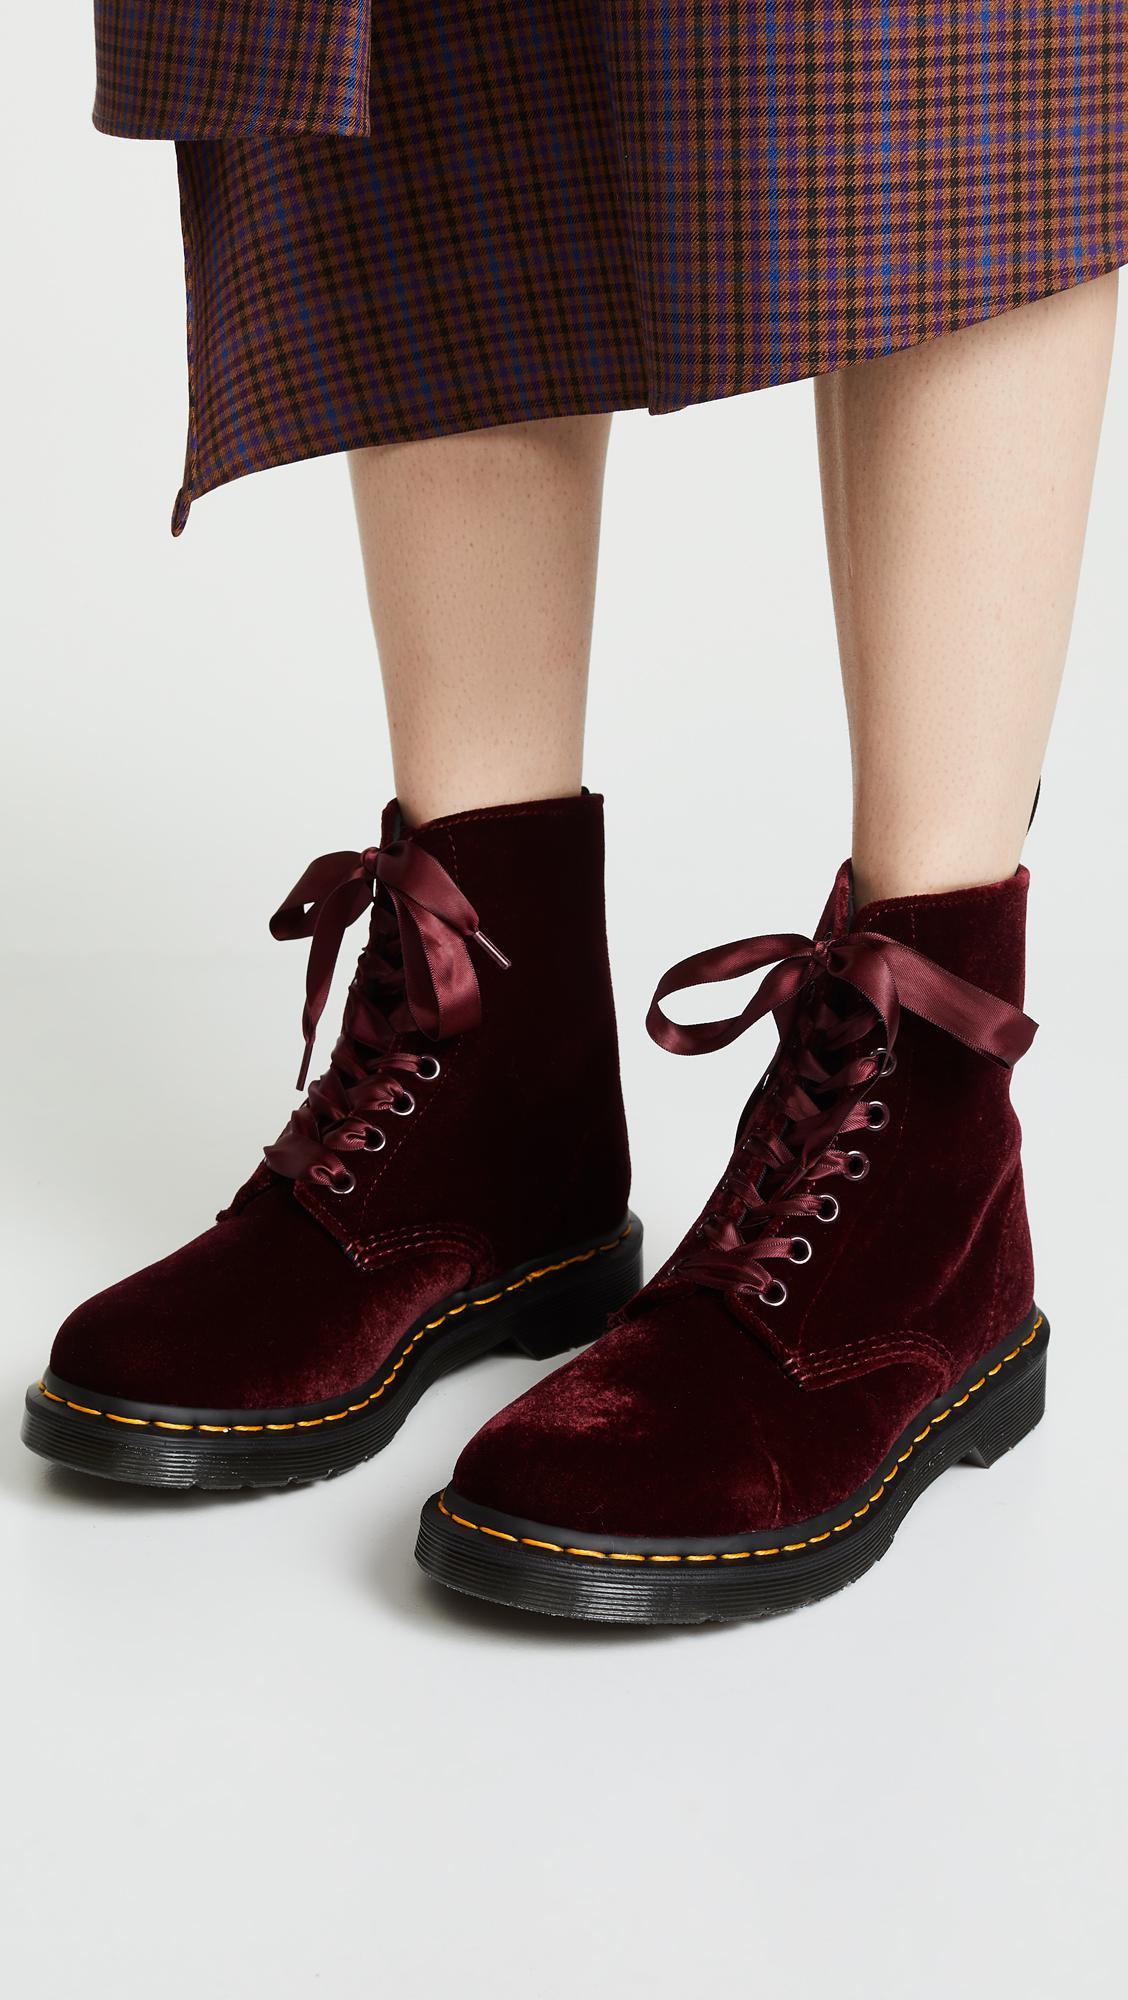 84f8de1ba Dr. Martens 1460 Pascal Velvet 8 Eye Boots in Red - Lyst